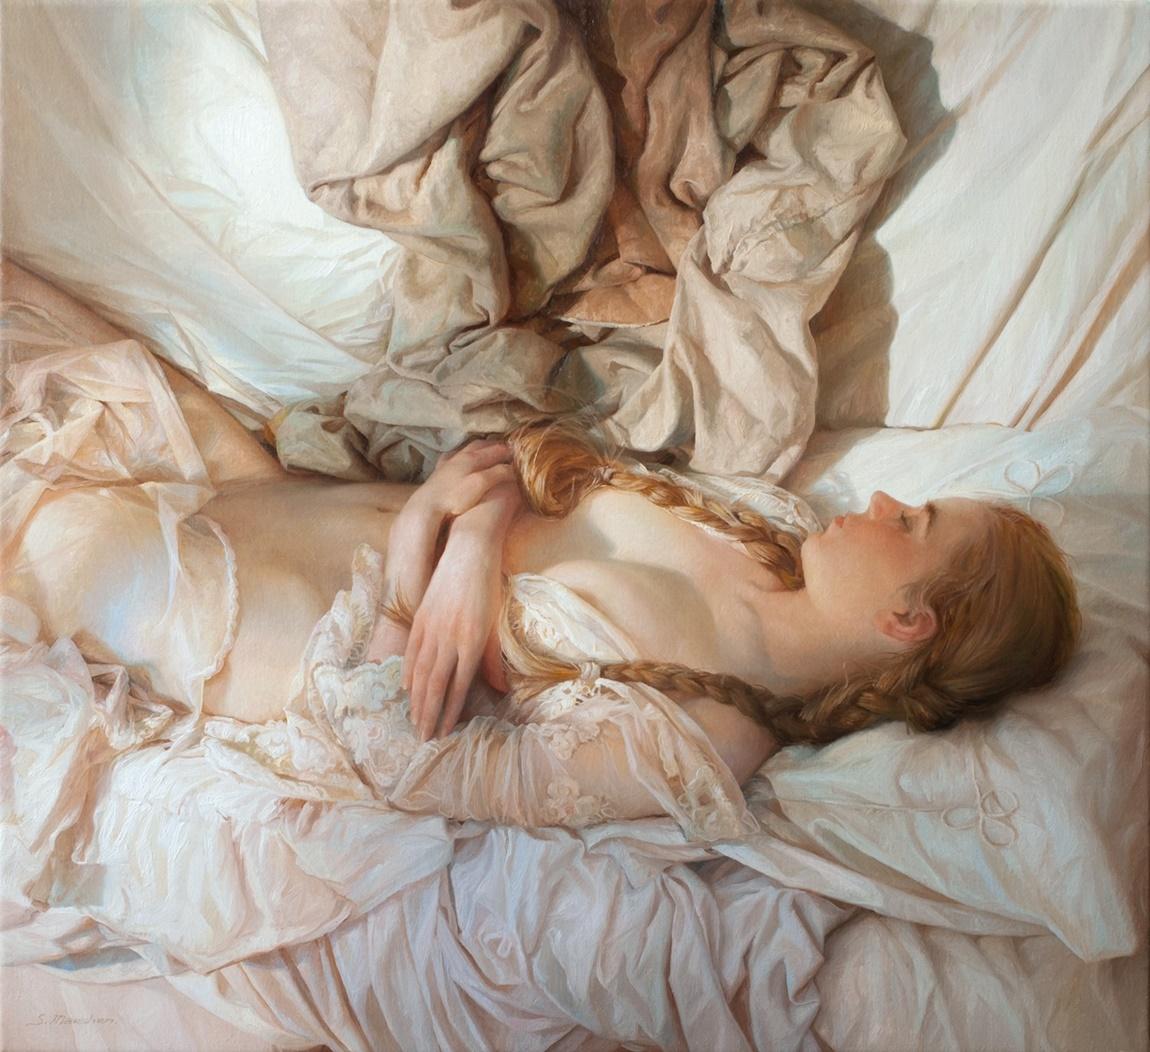 Women's images by a Russian realist artist Sergey Marshennikov - 20